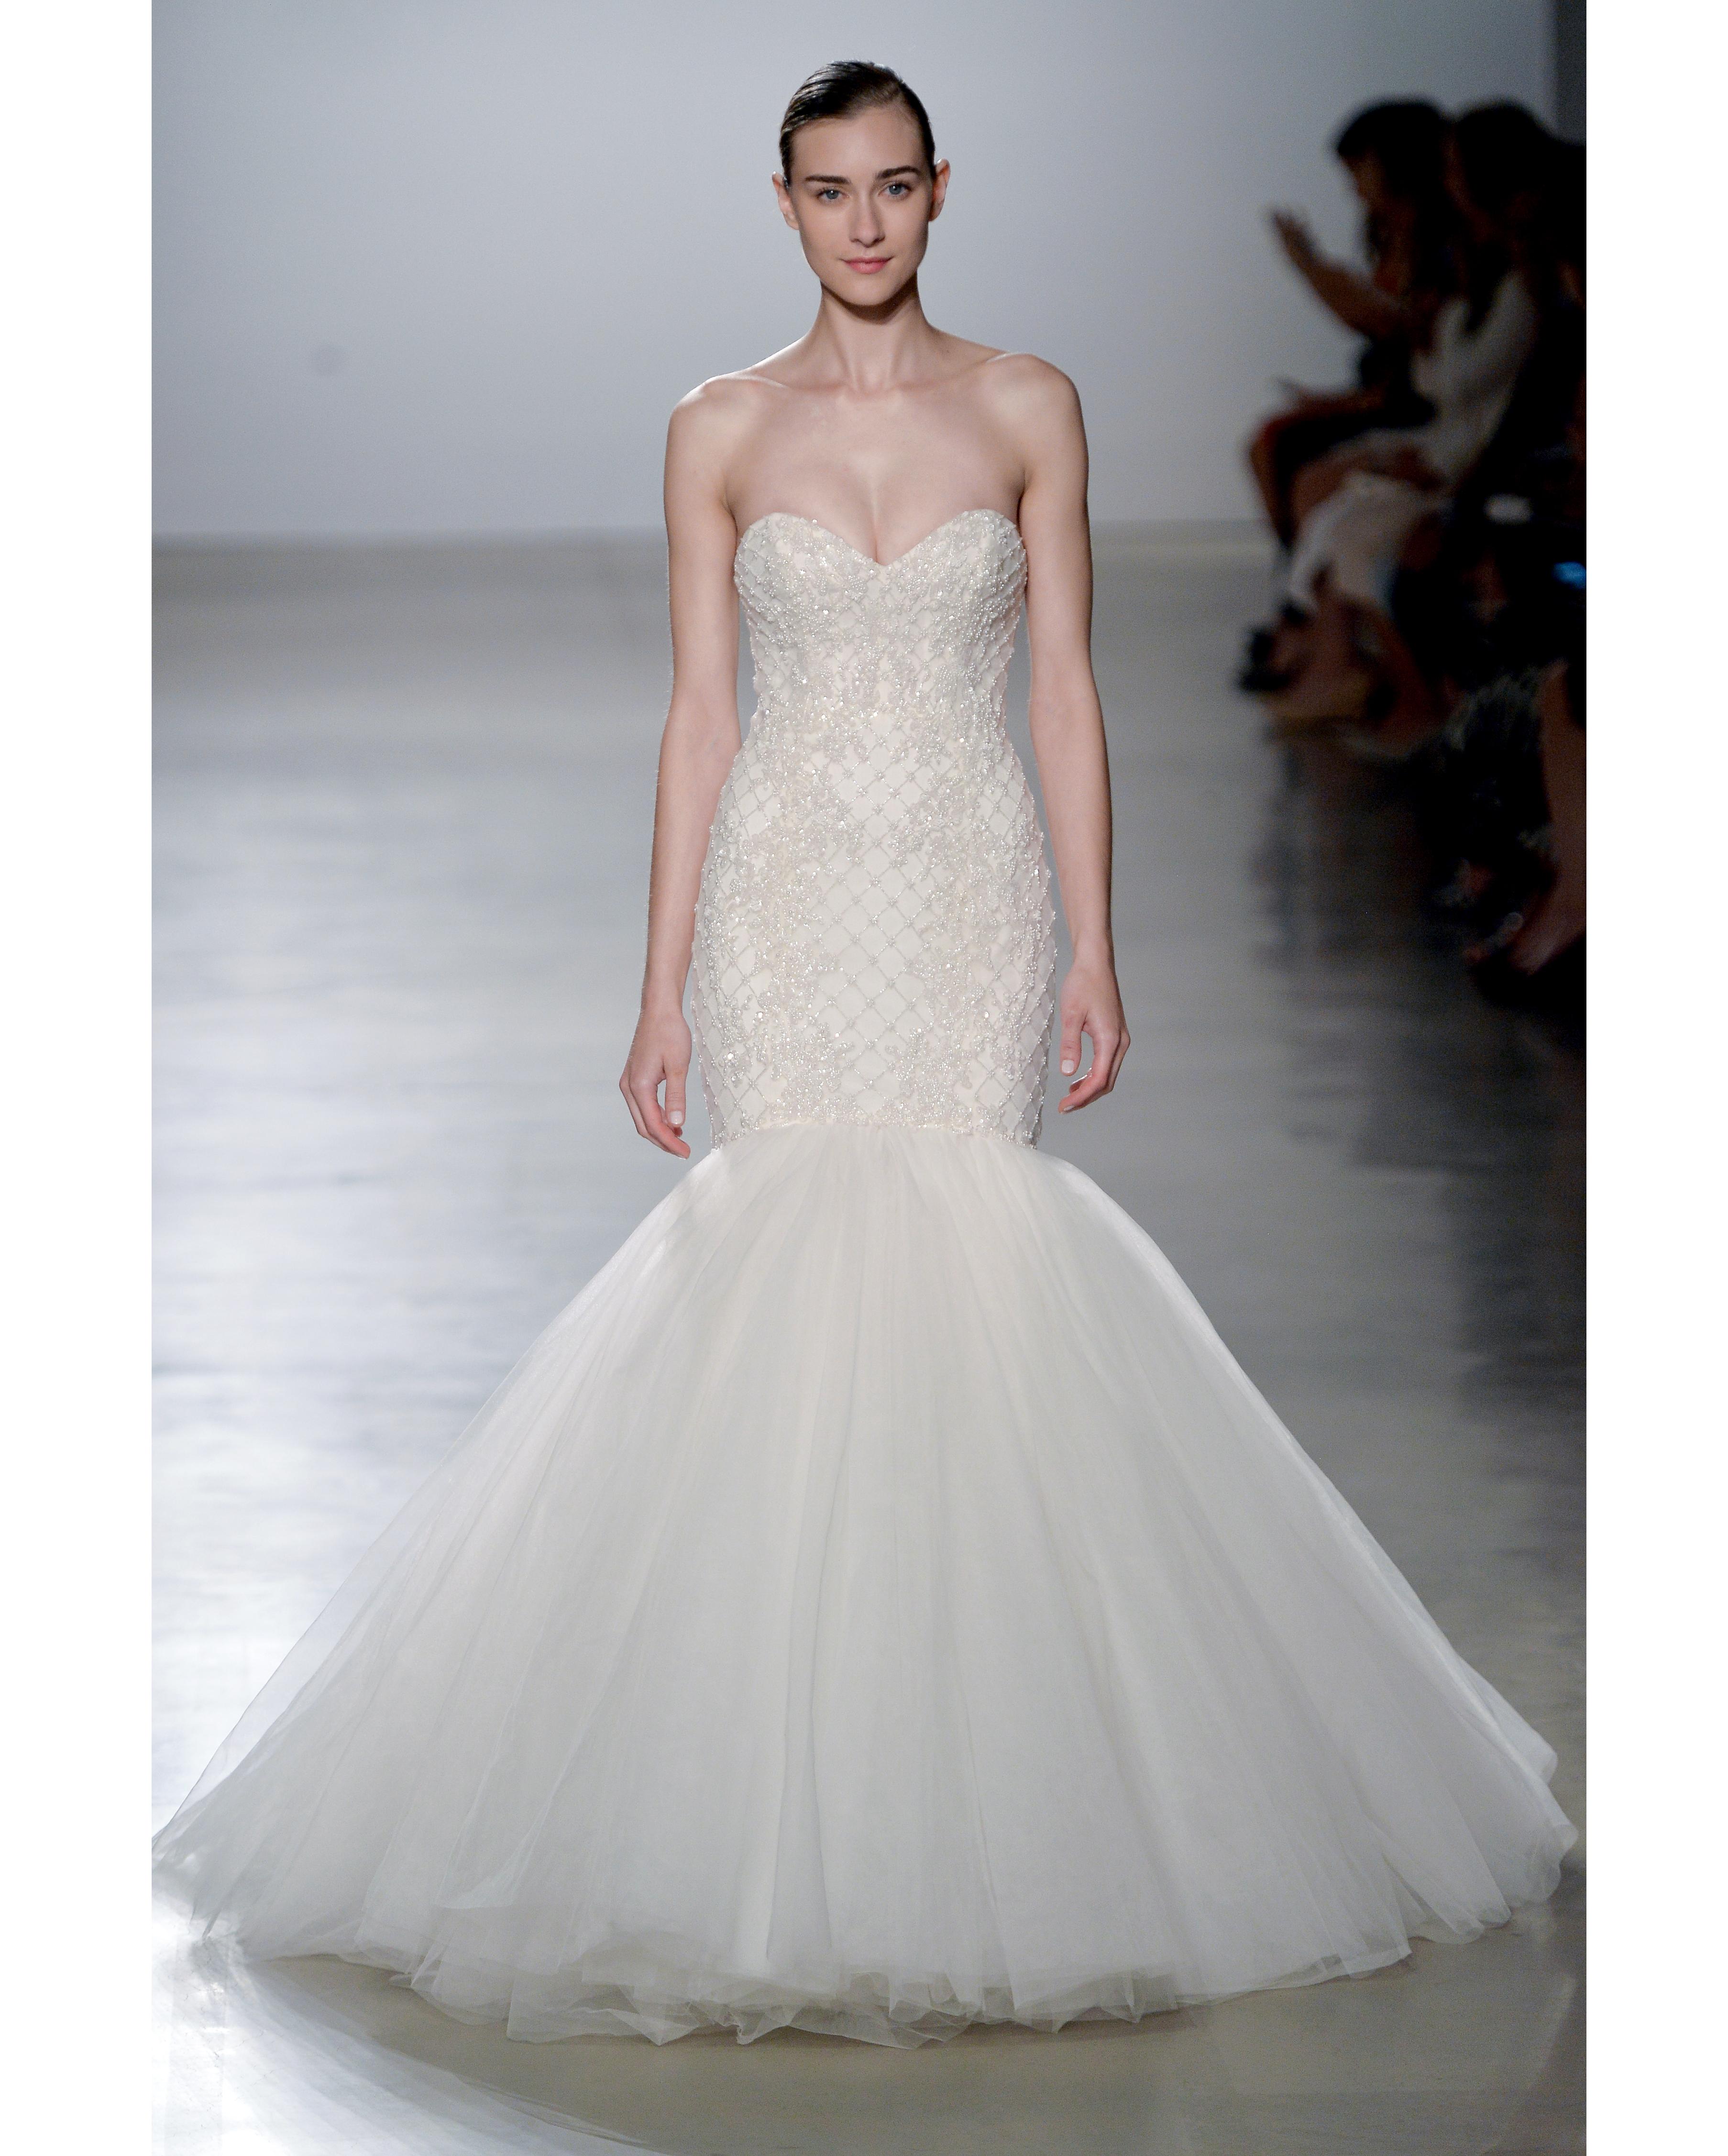 50-states-wedding-dresses-idaho-kenneth-pool-0615.jpg